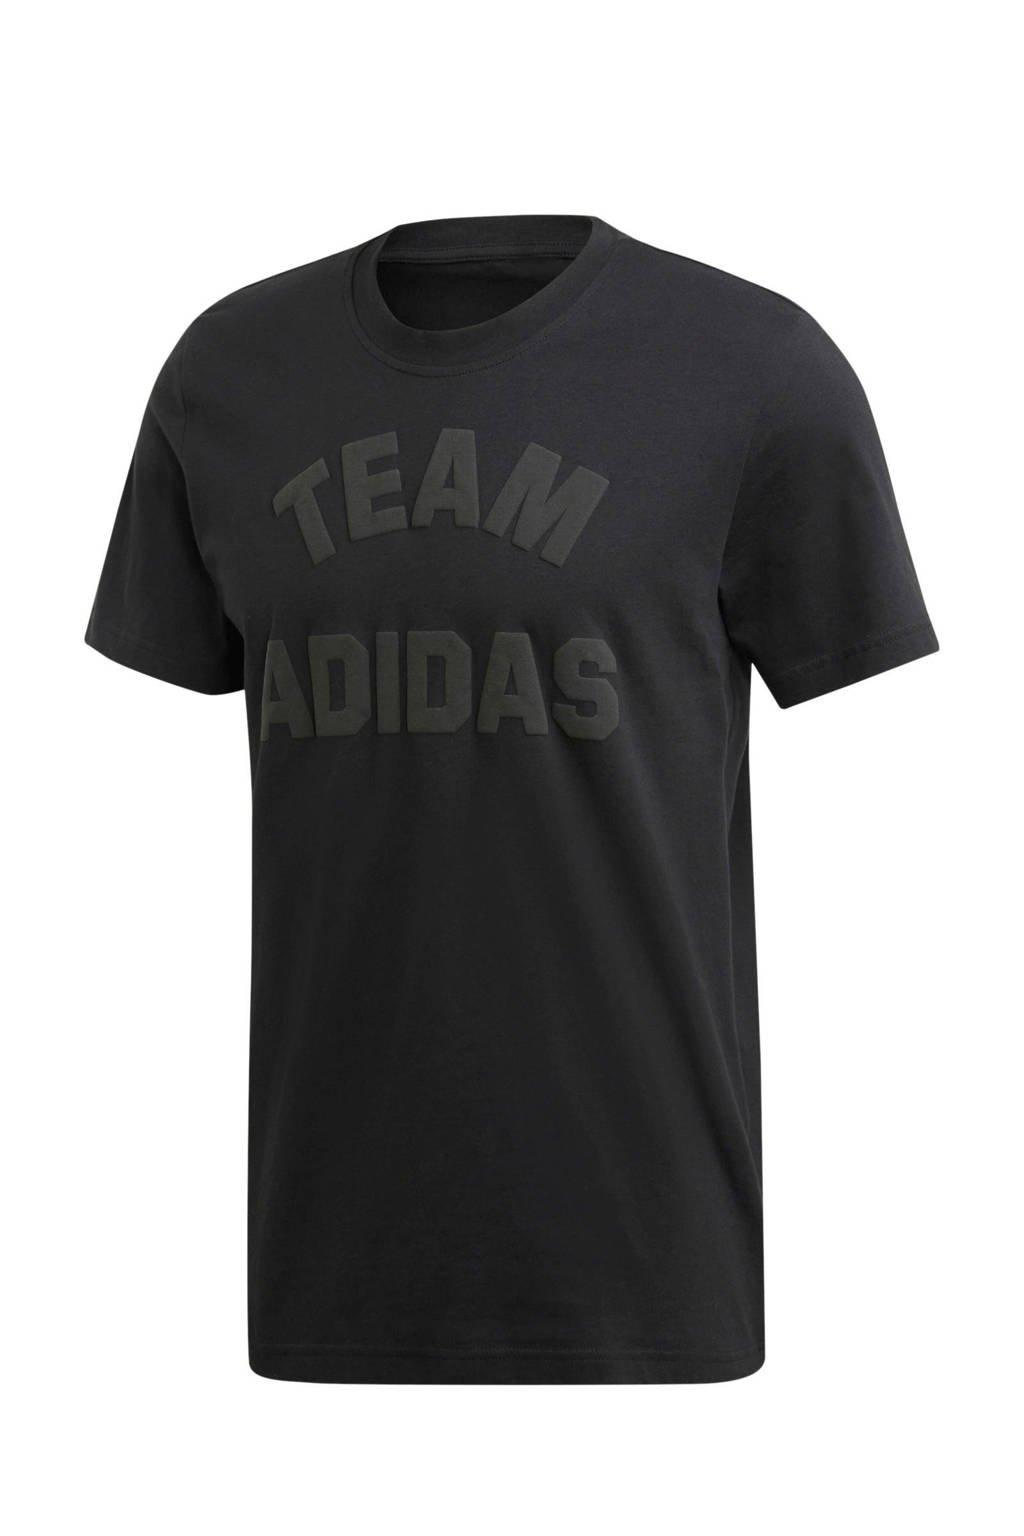 adidas   sport T-shirt antraciet, Black